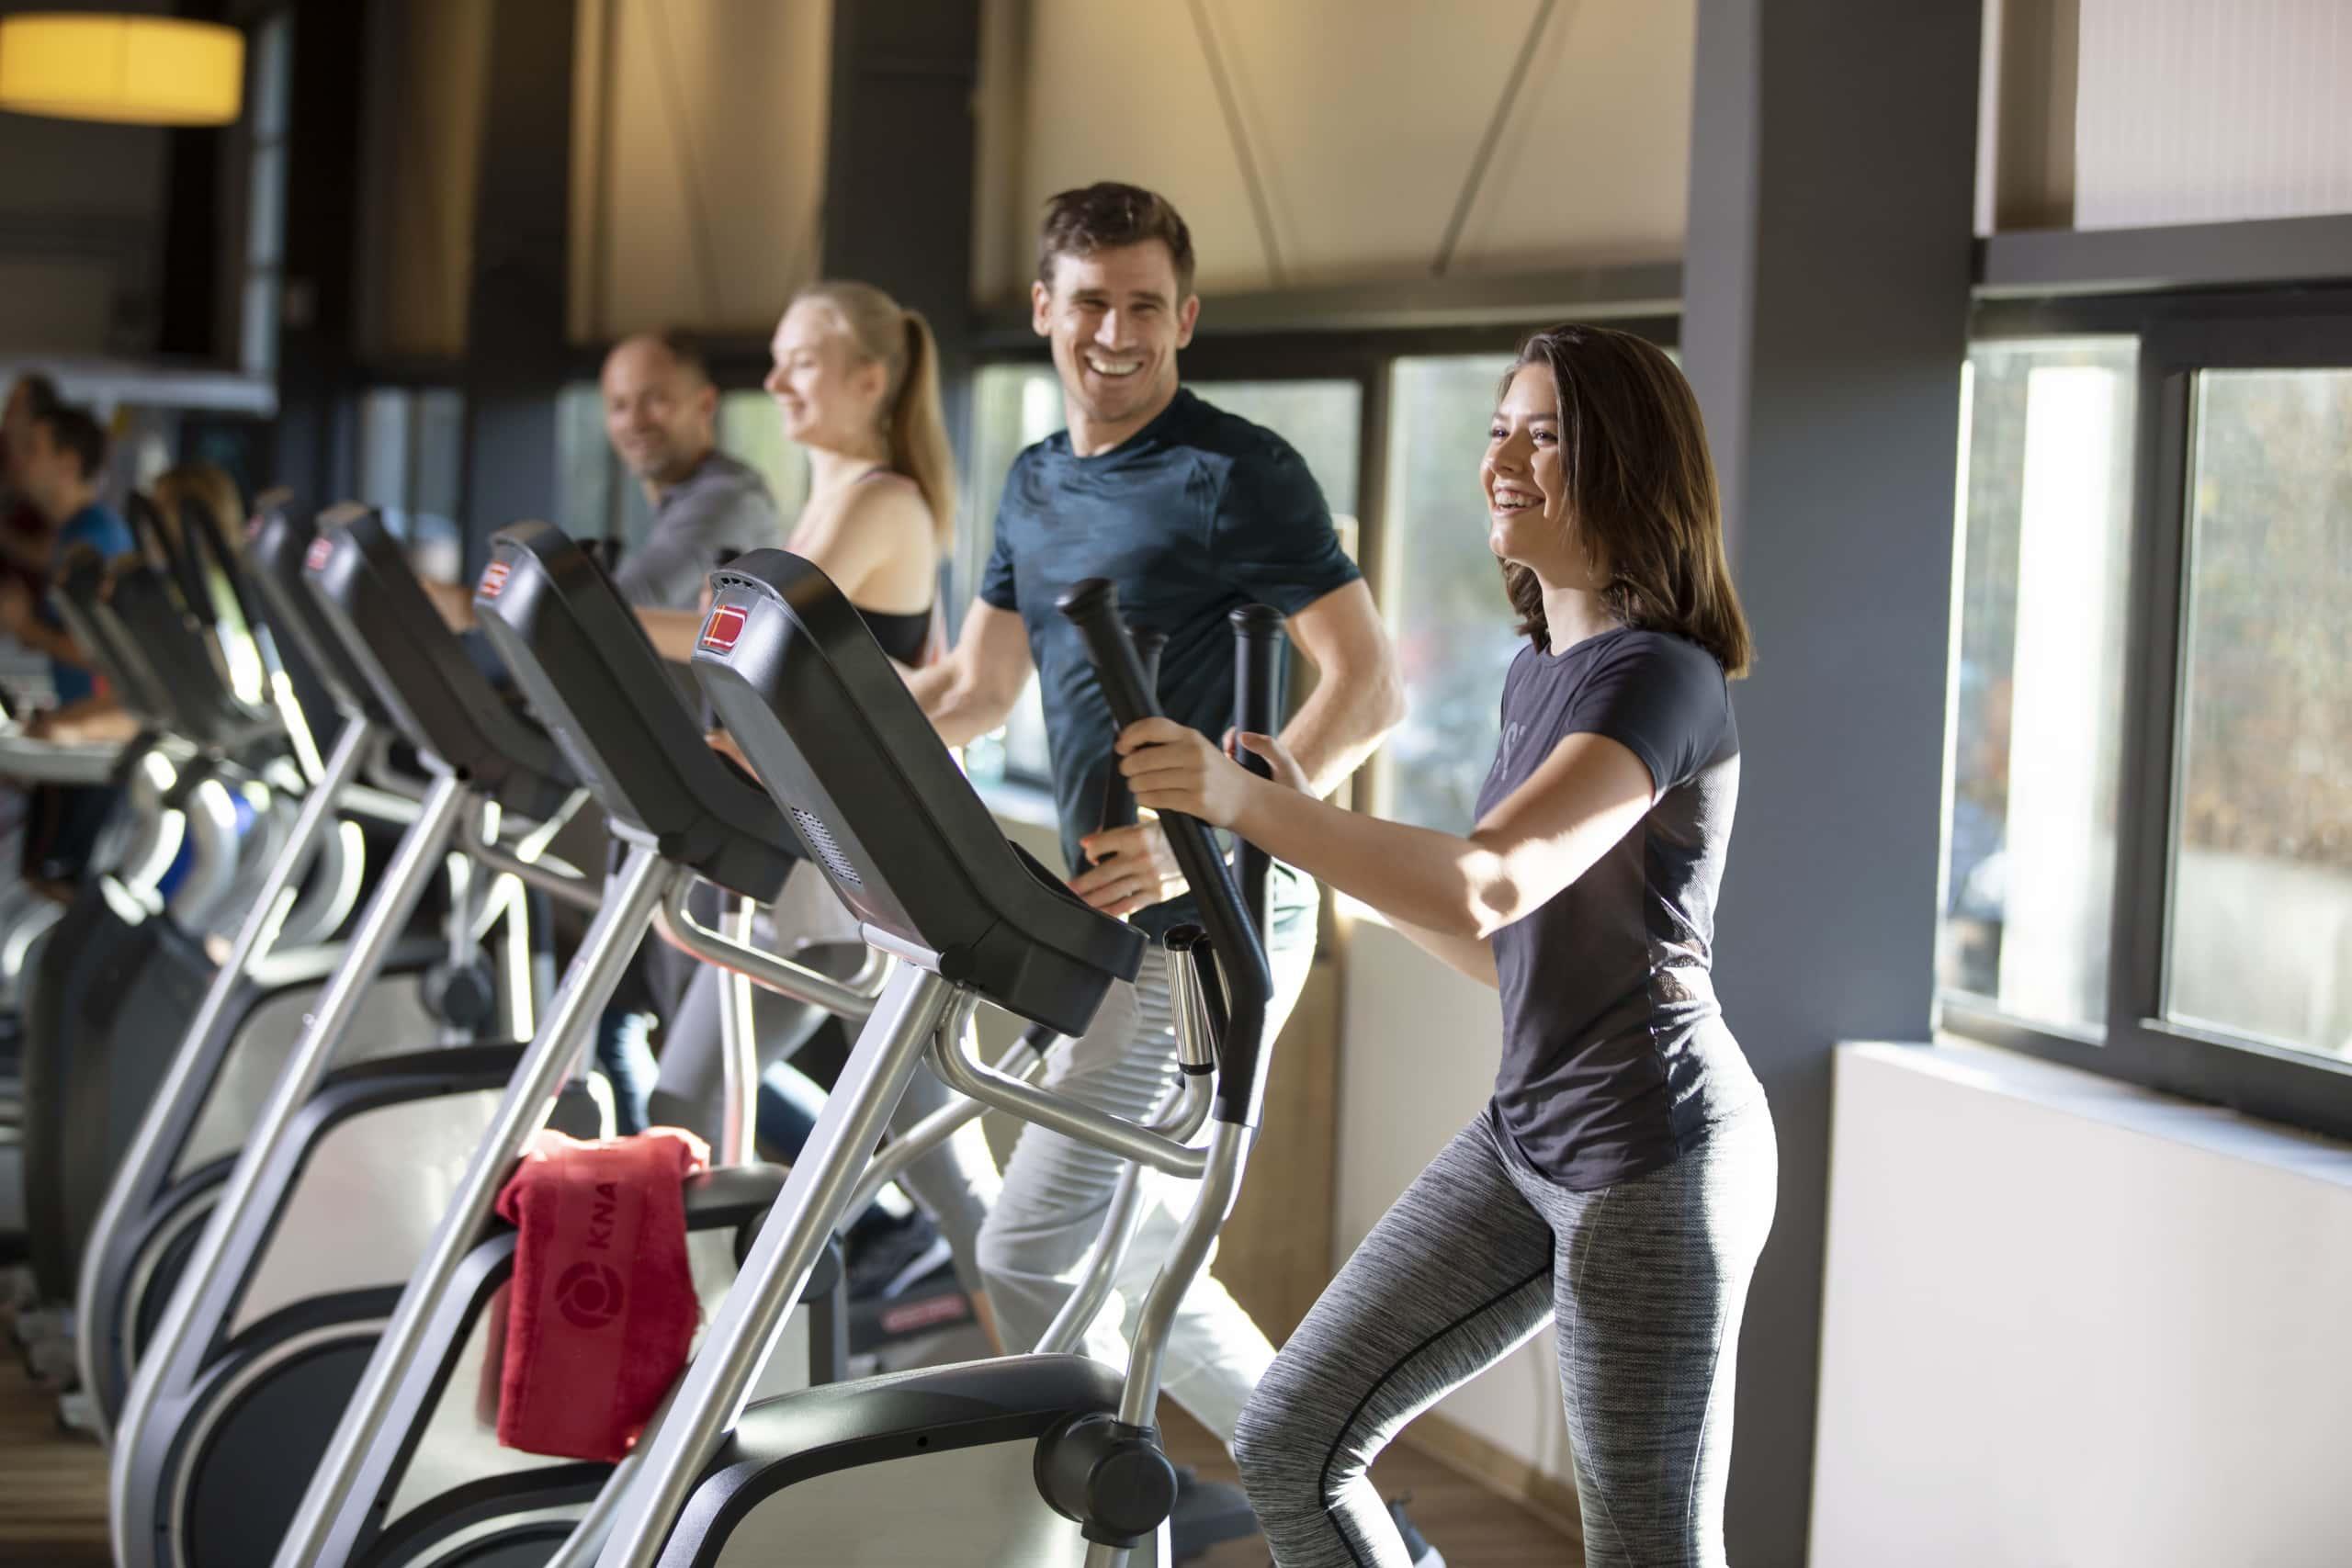 Glücksgefühle und Fitness